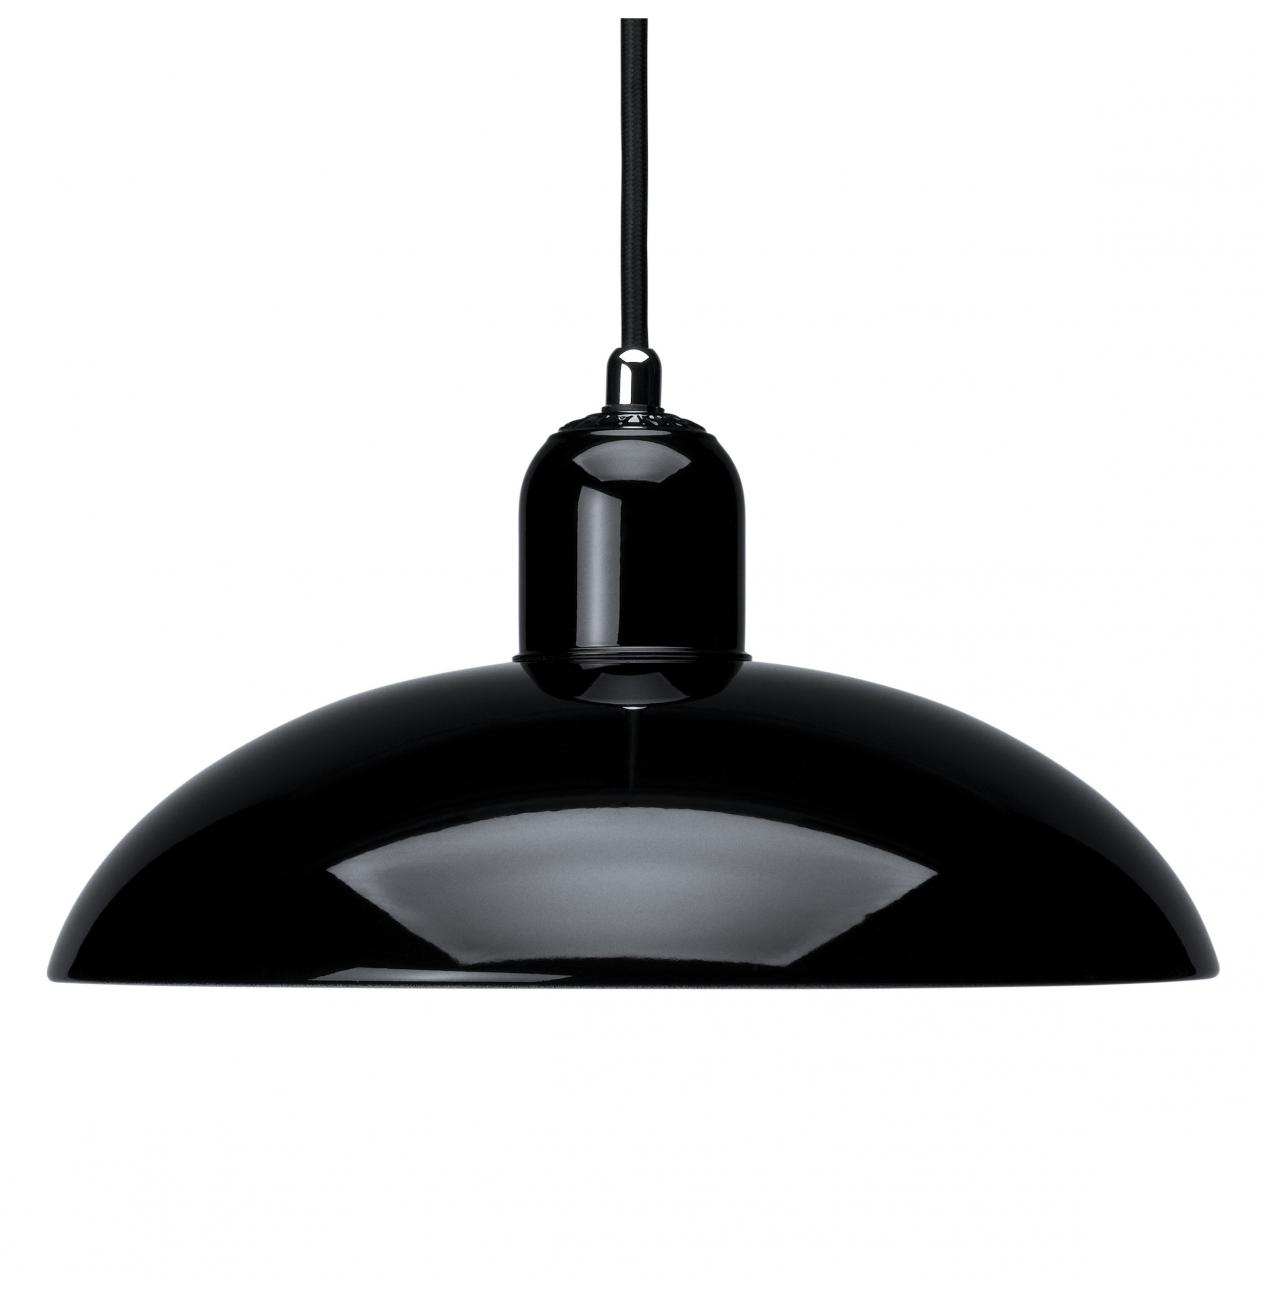 lightyears hanglamp kaiser idell 6631 p versteeg. Black Bedroom Furniture Sets. Home Design Ideas